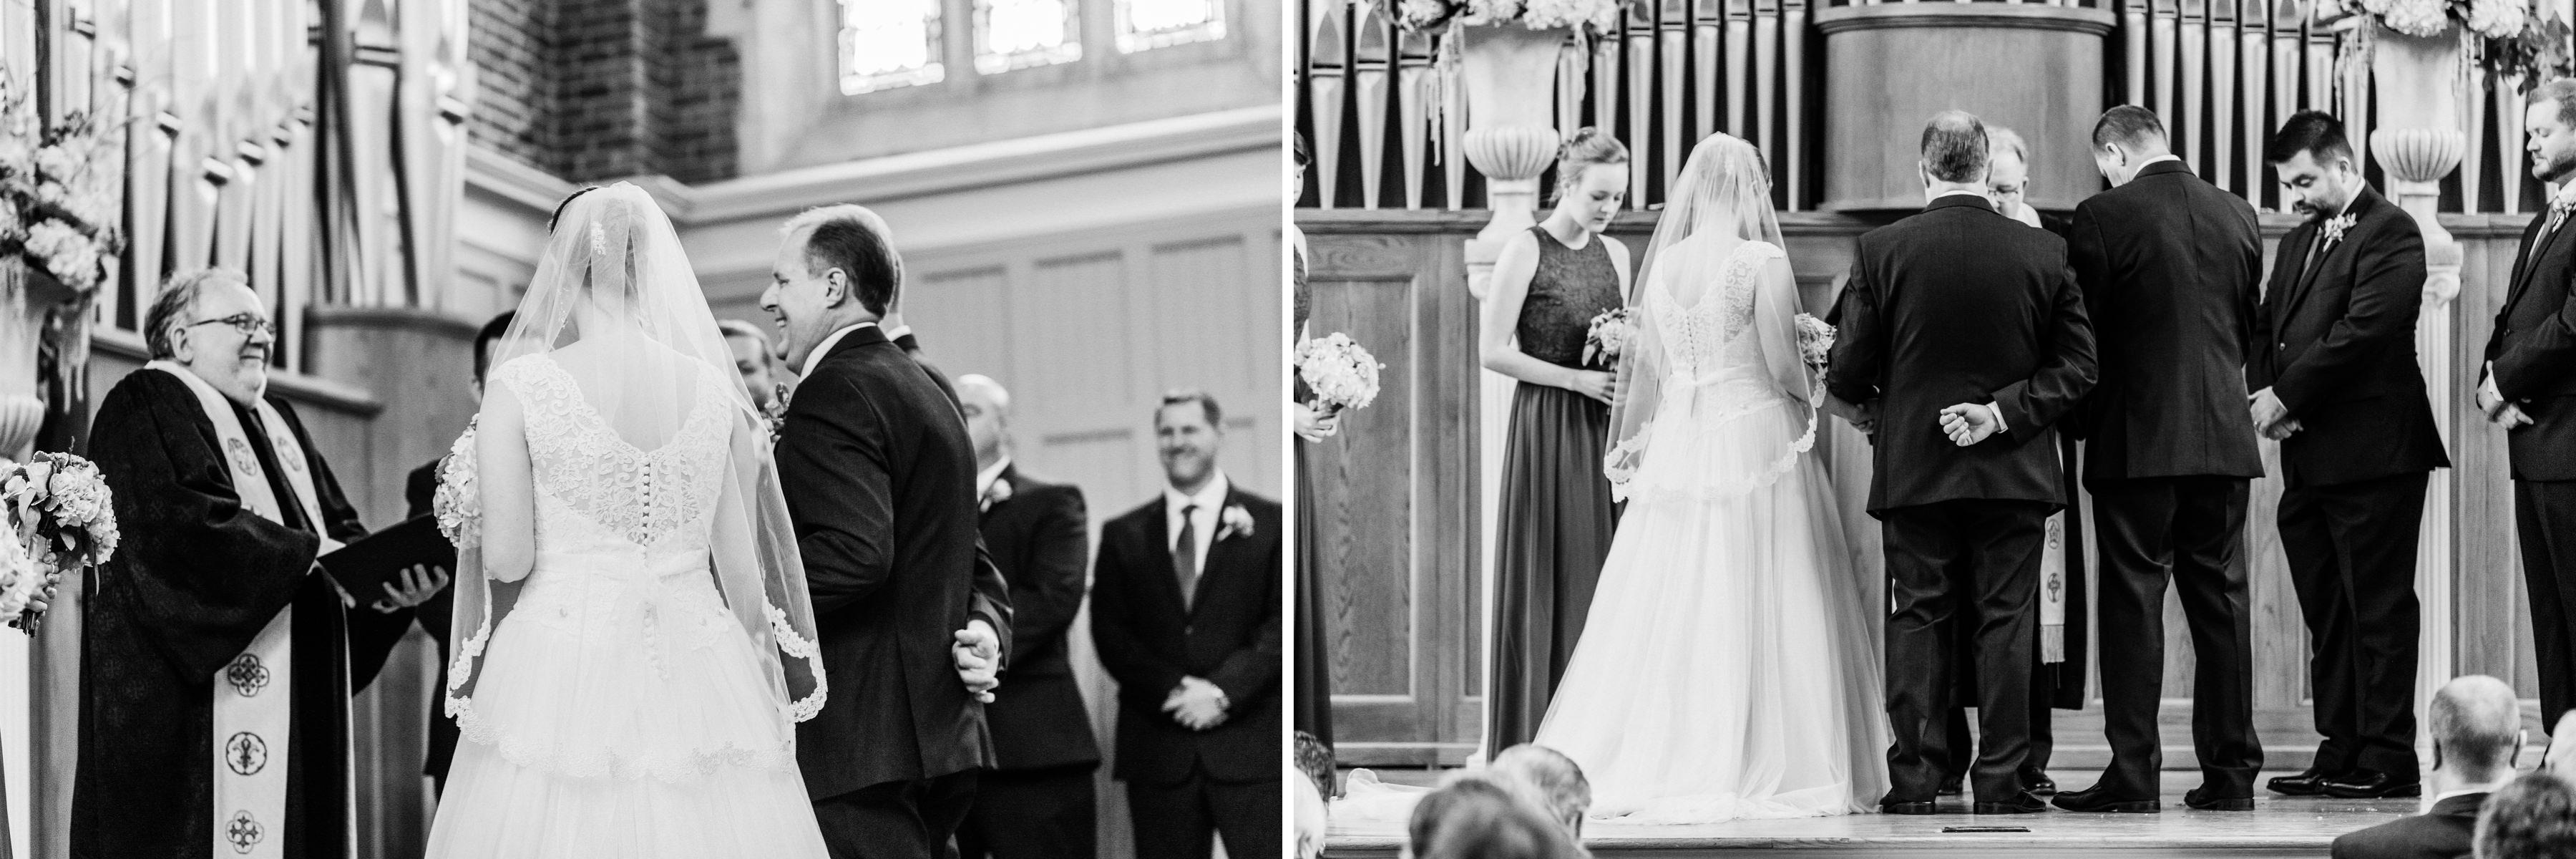 MAULDIN_WEDDING_MONTGOMERY_ALABAMA_WEDDING_PHOTOGRAPHY_62